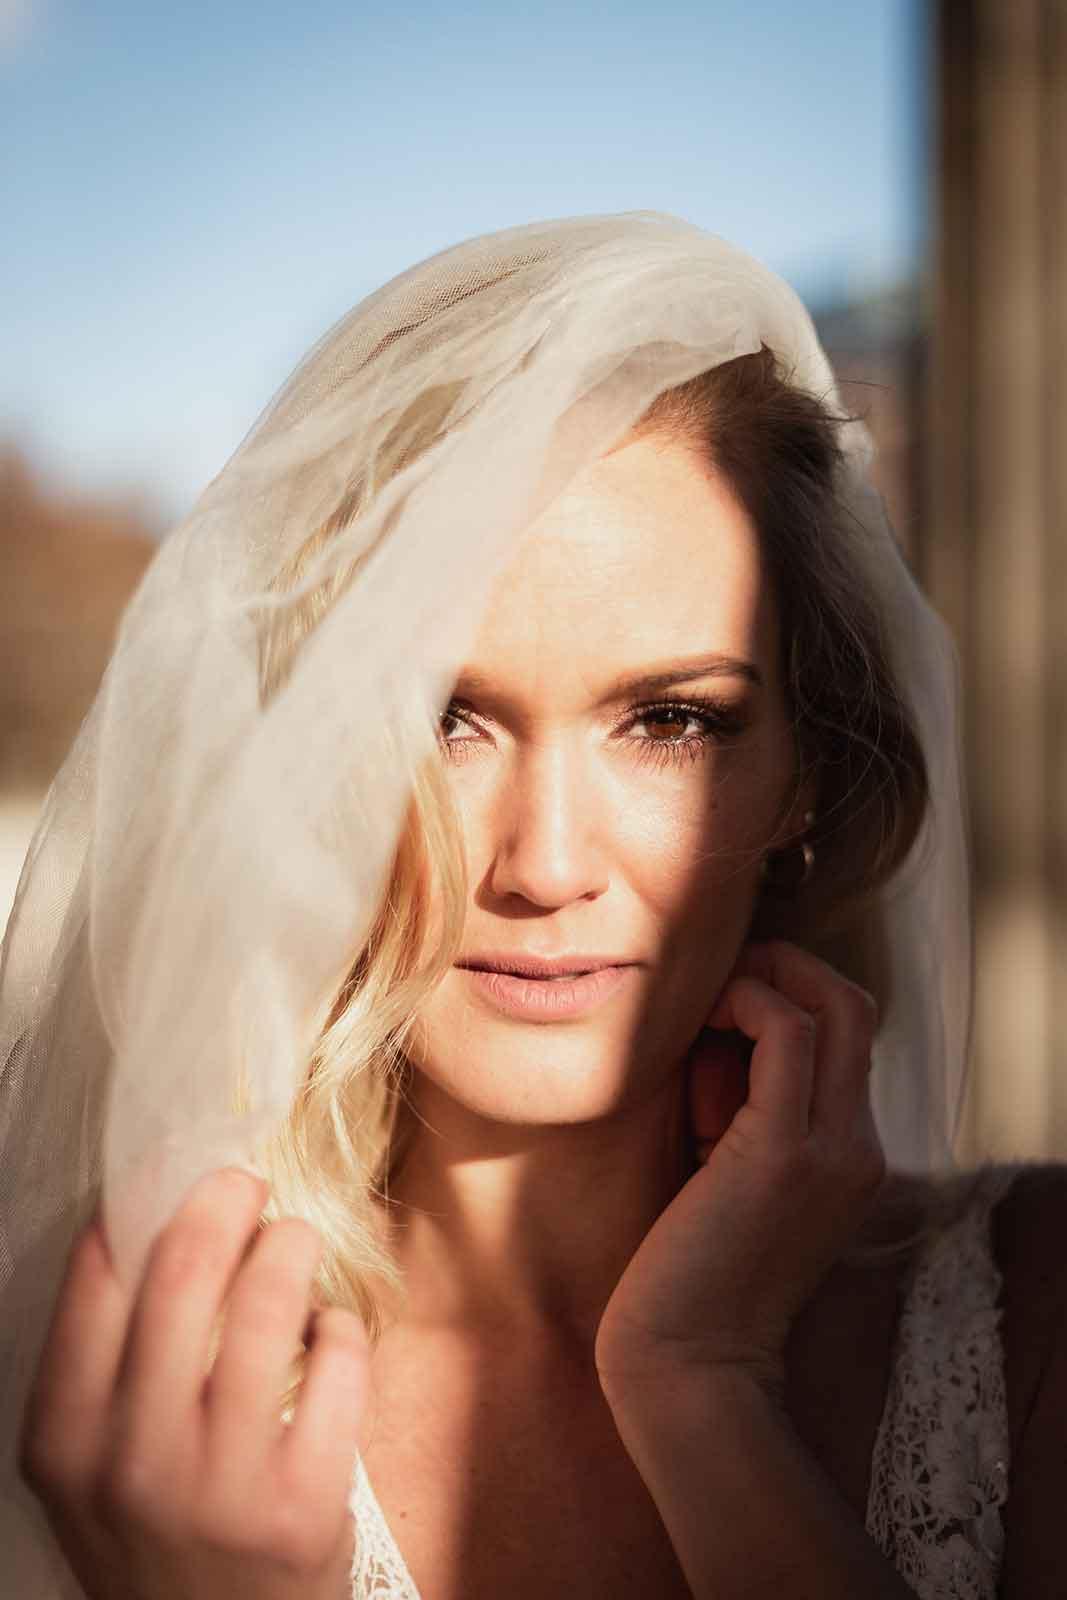 Das perfekte Brautstyling